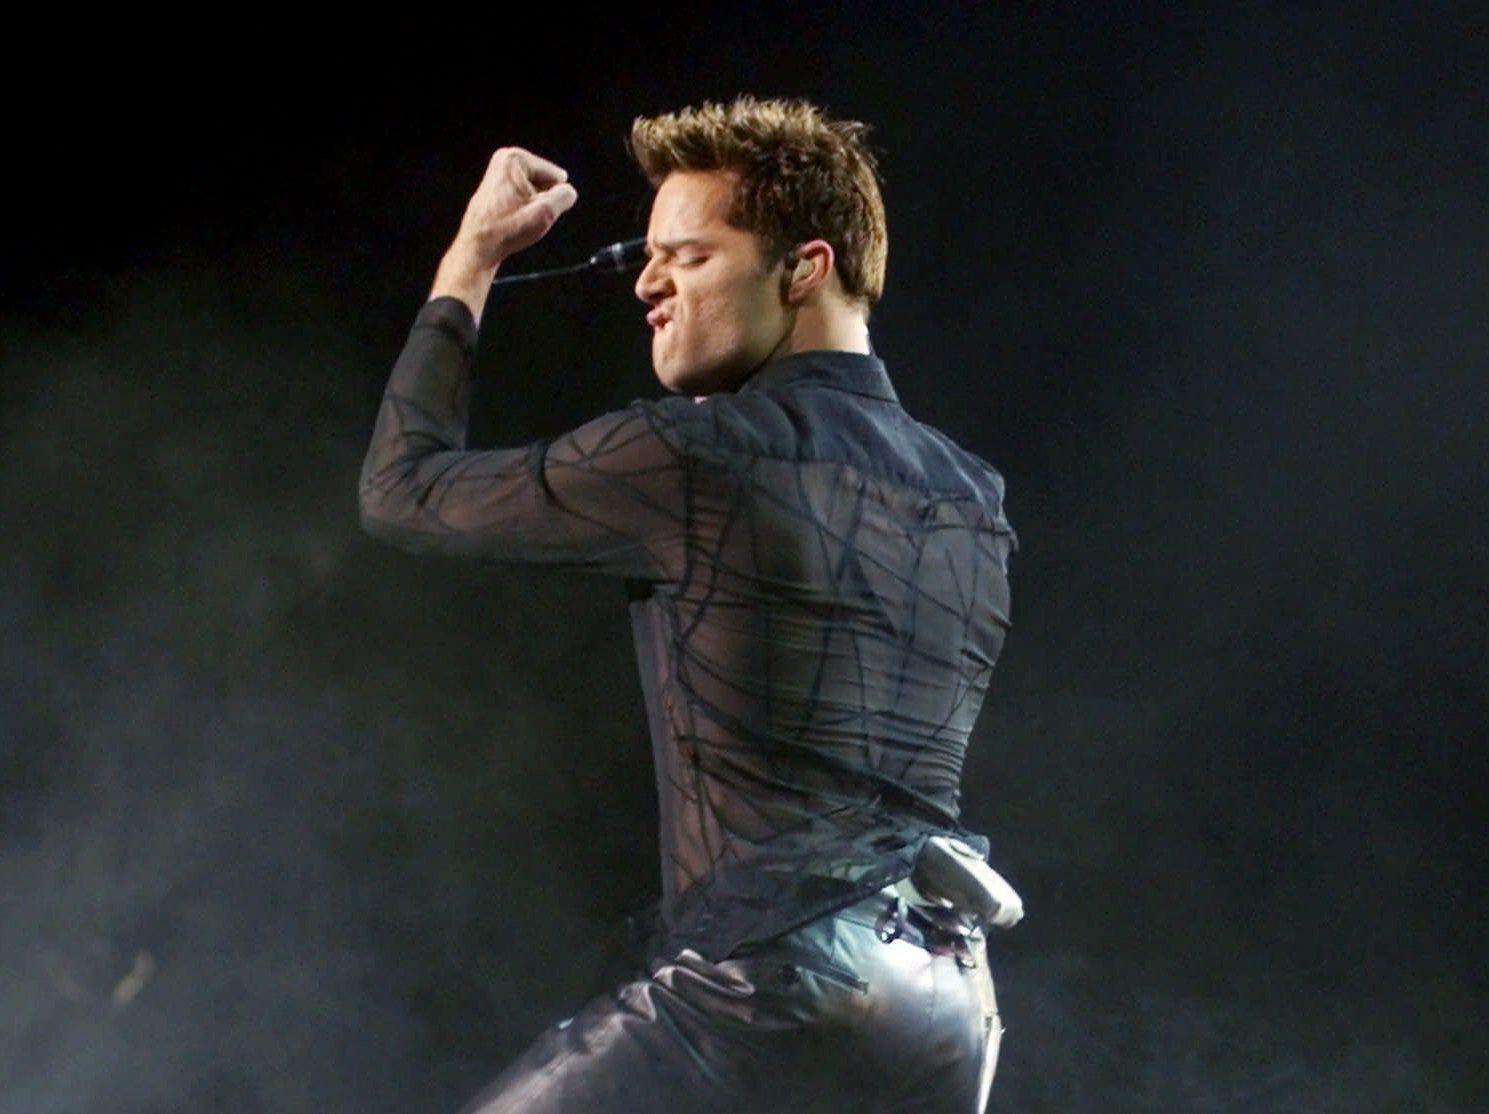 """Livin' La Vida Loca"" by Ricky Martin"